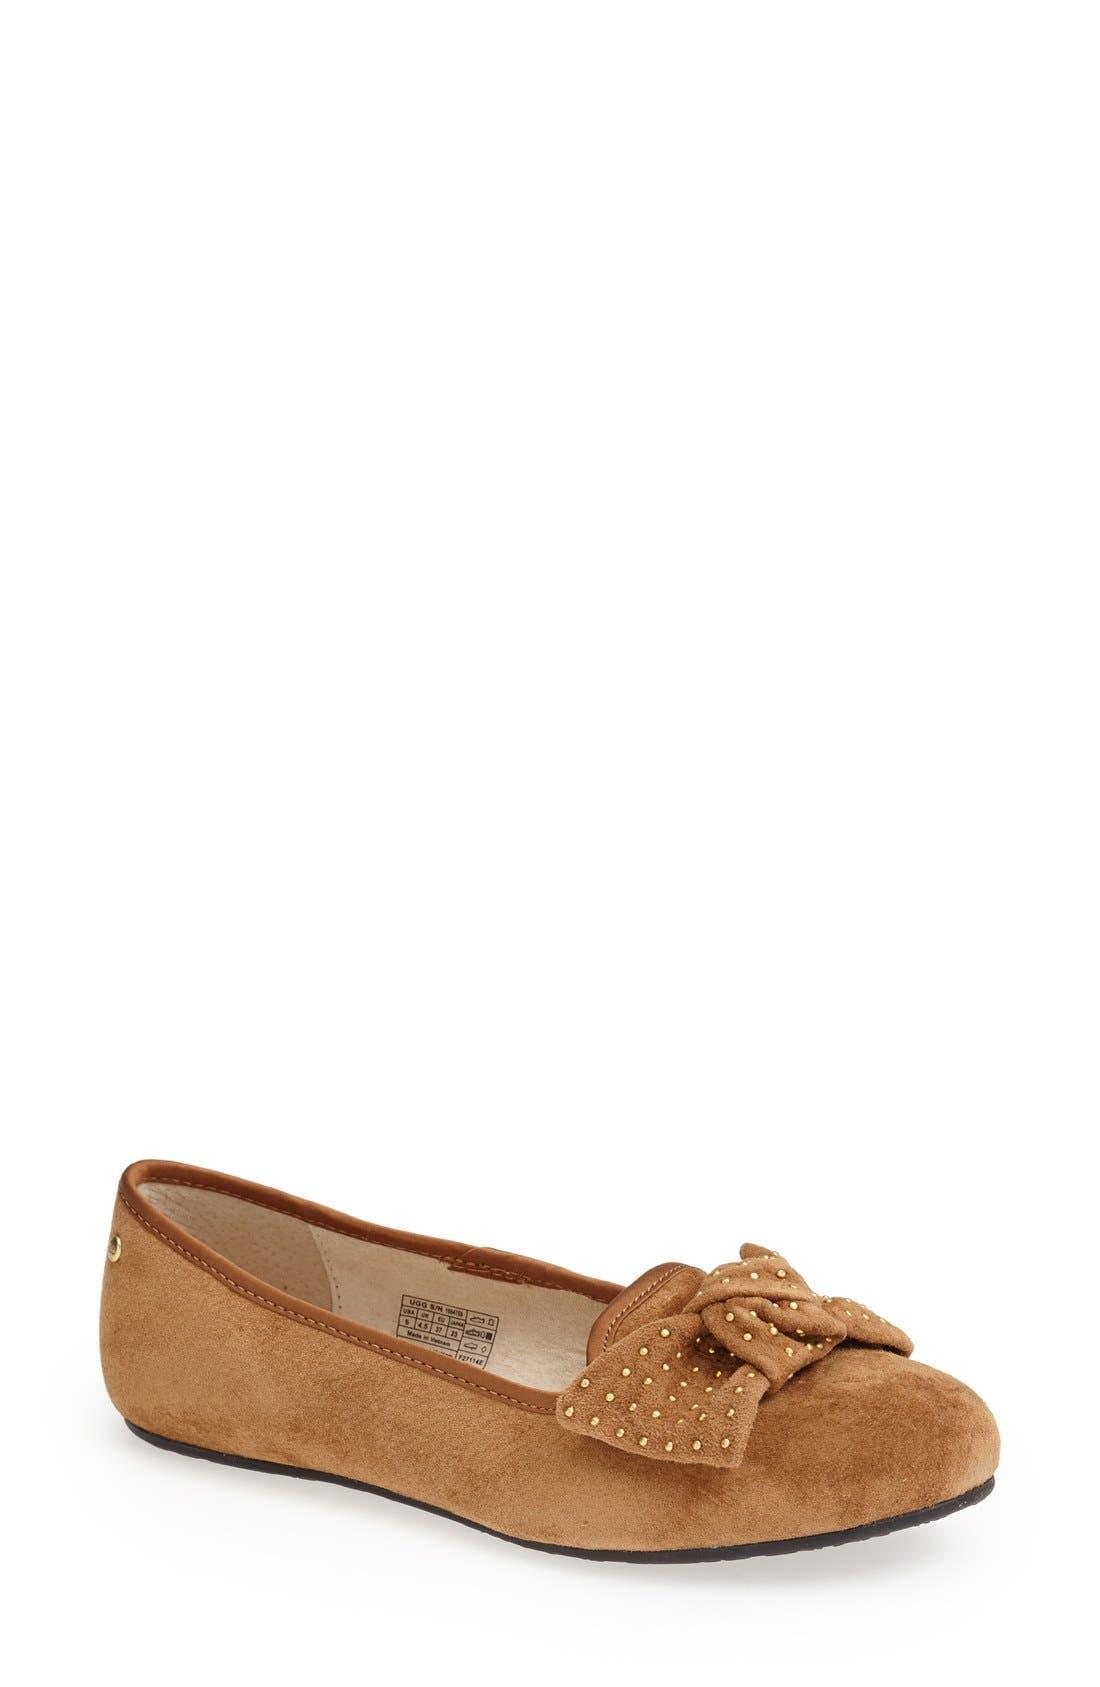 Main Image - UGG® 'Alloway -Studded Bow' Flat (Women)